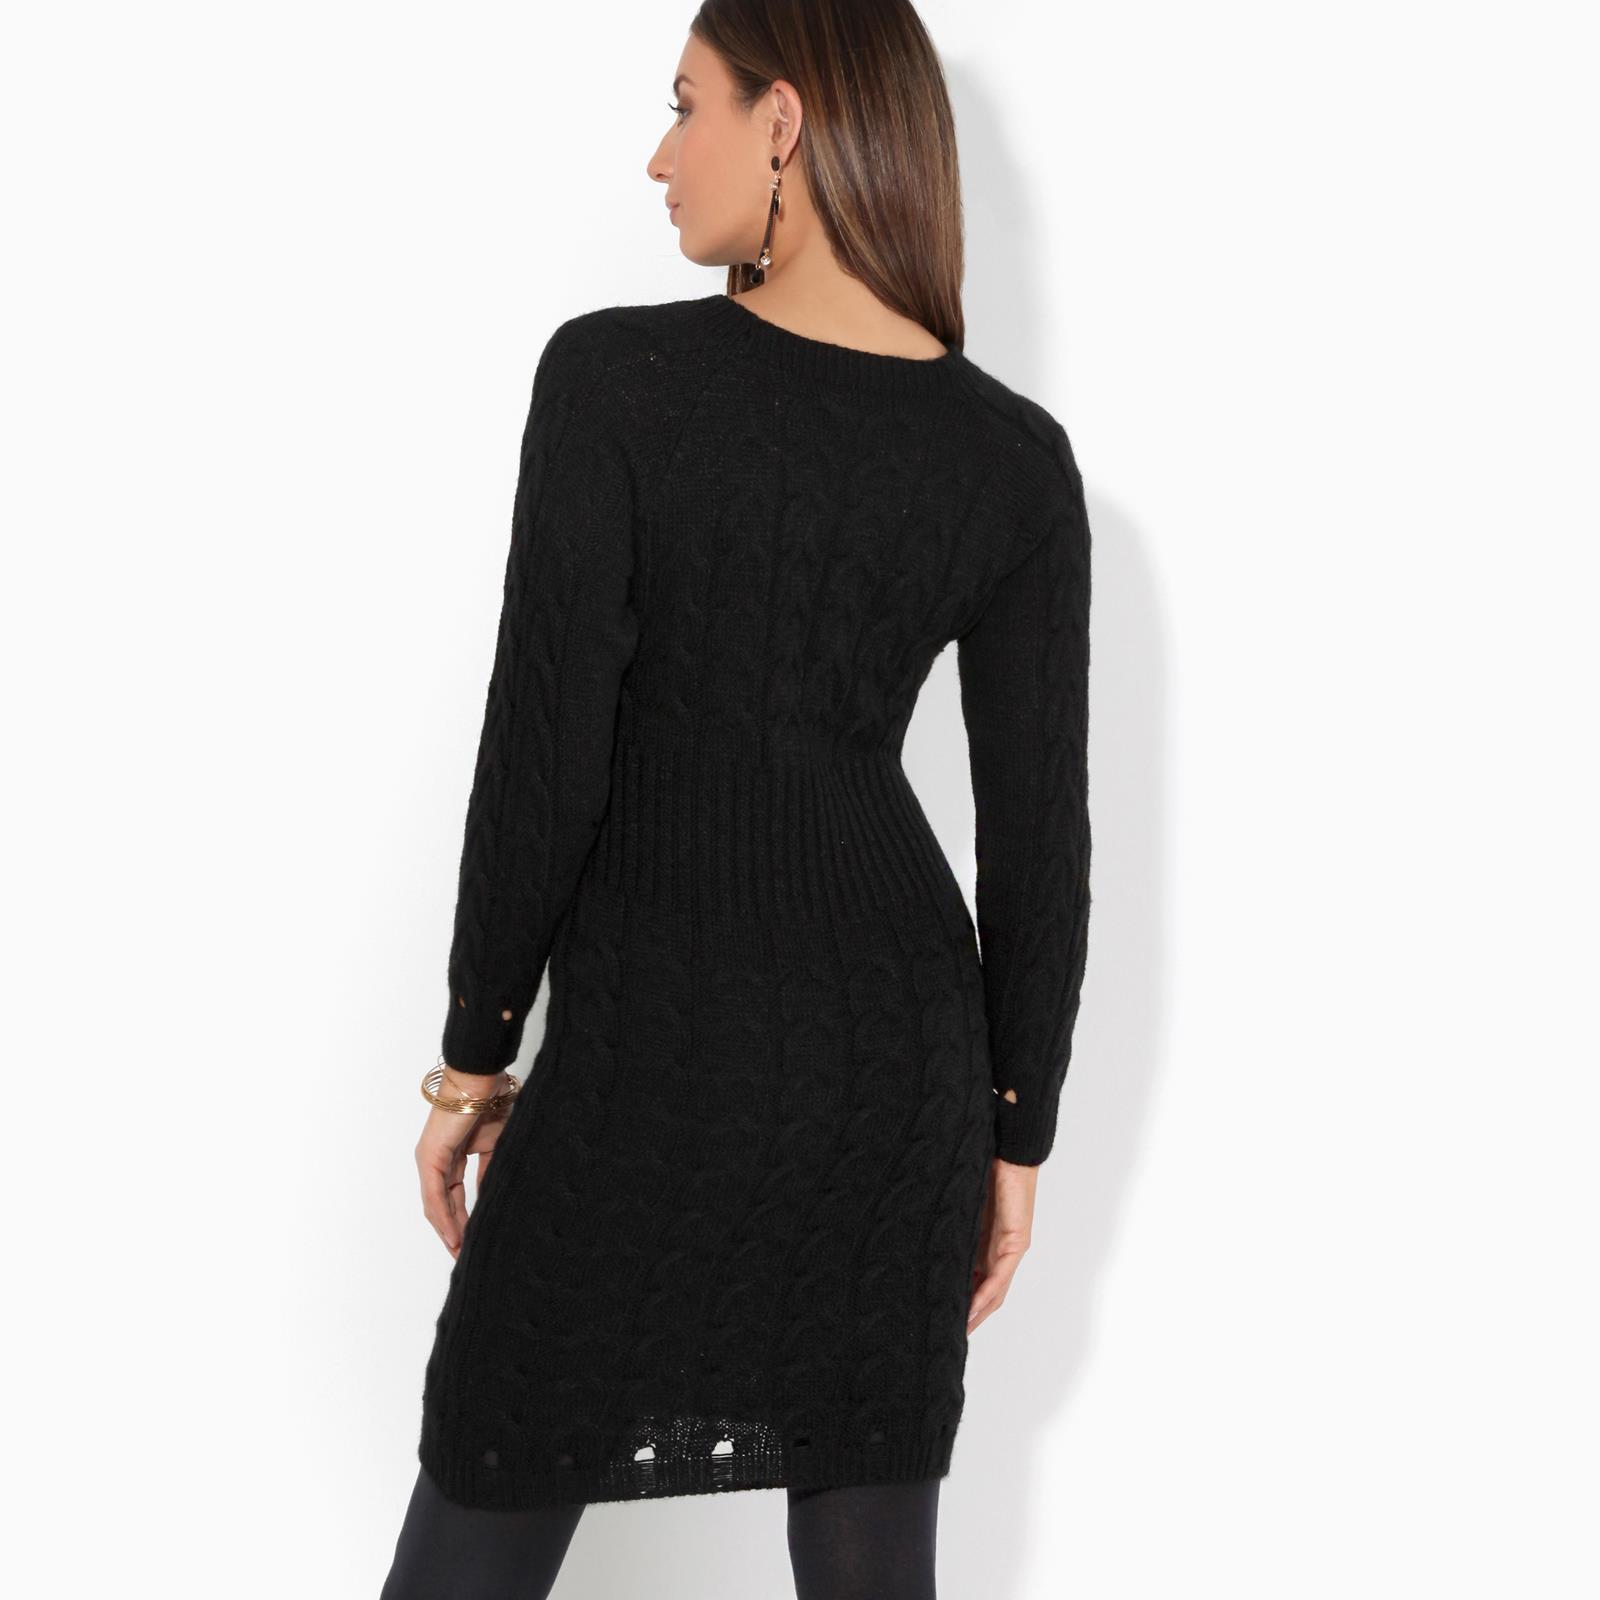 Womens-Ladies-Jumper-Dress-Longsleeve-Mini-Warm-Winter-Knit-Top-Bodycon thumbnail 7